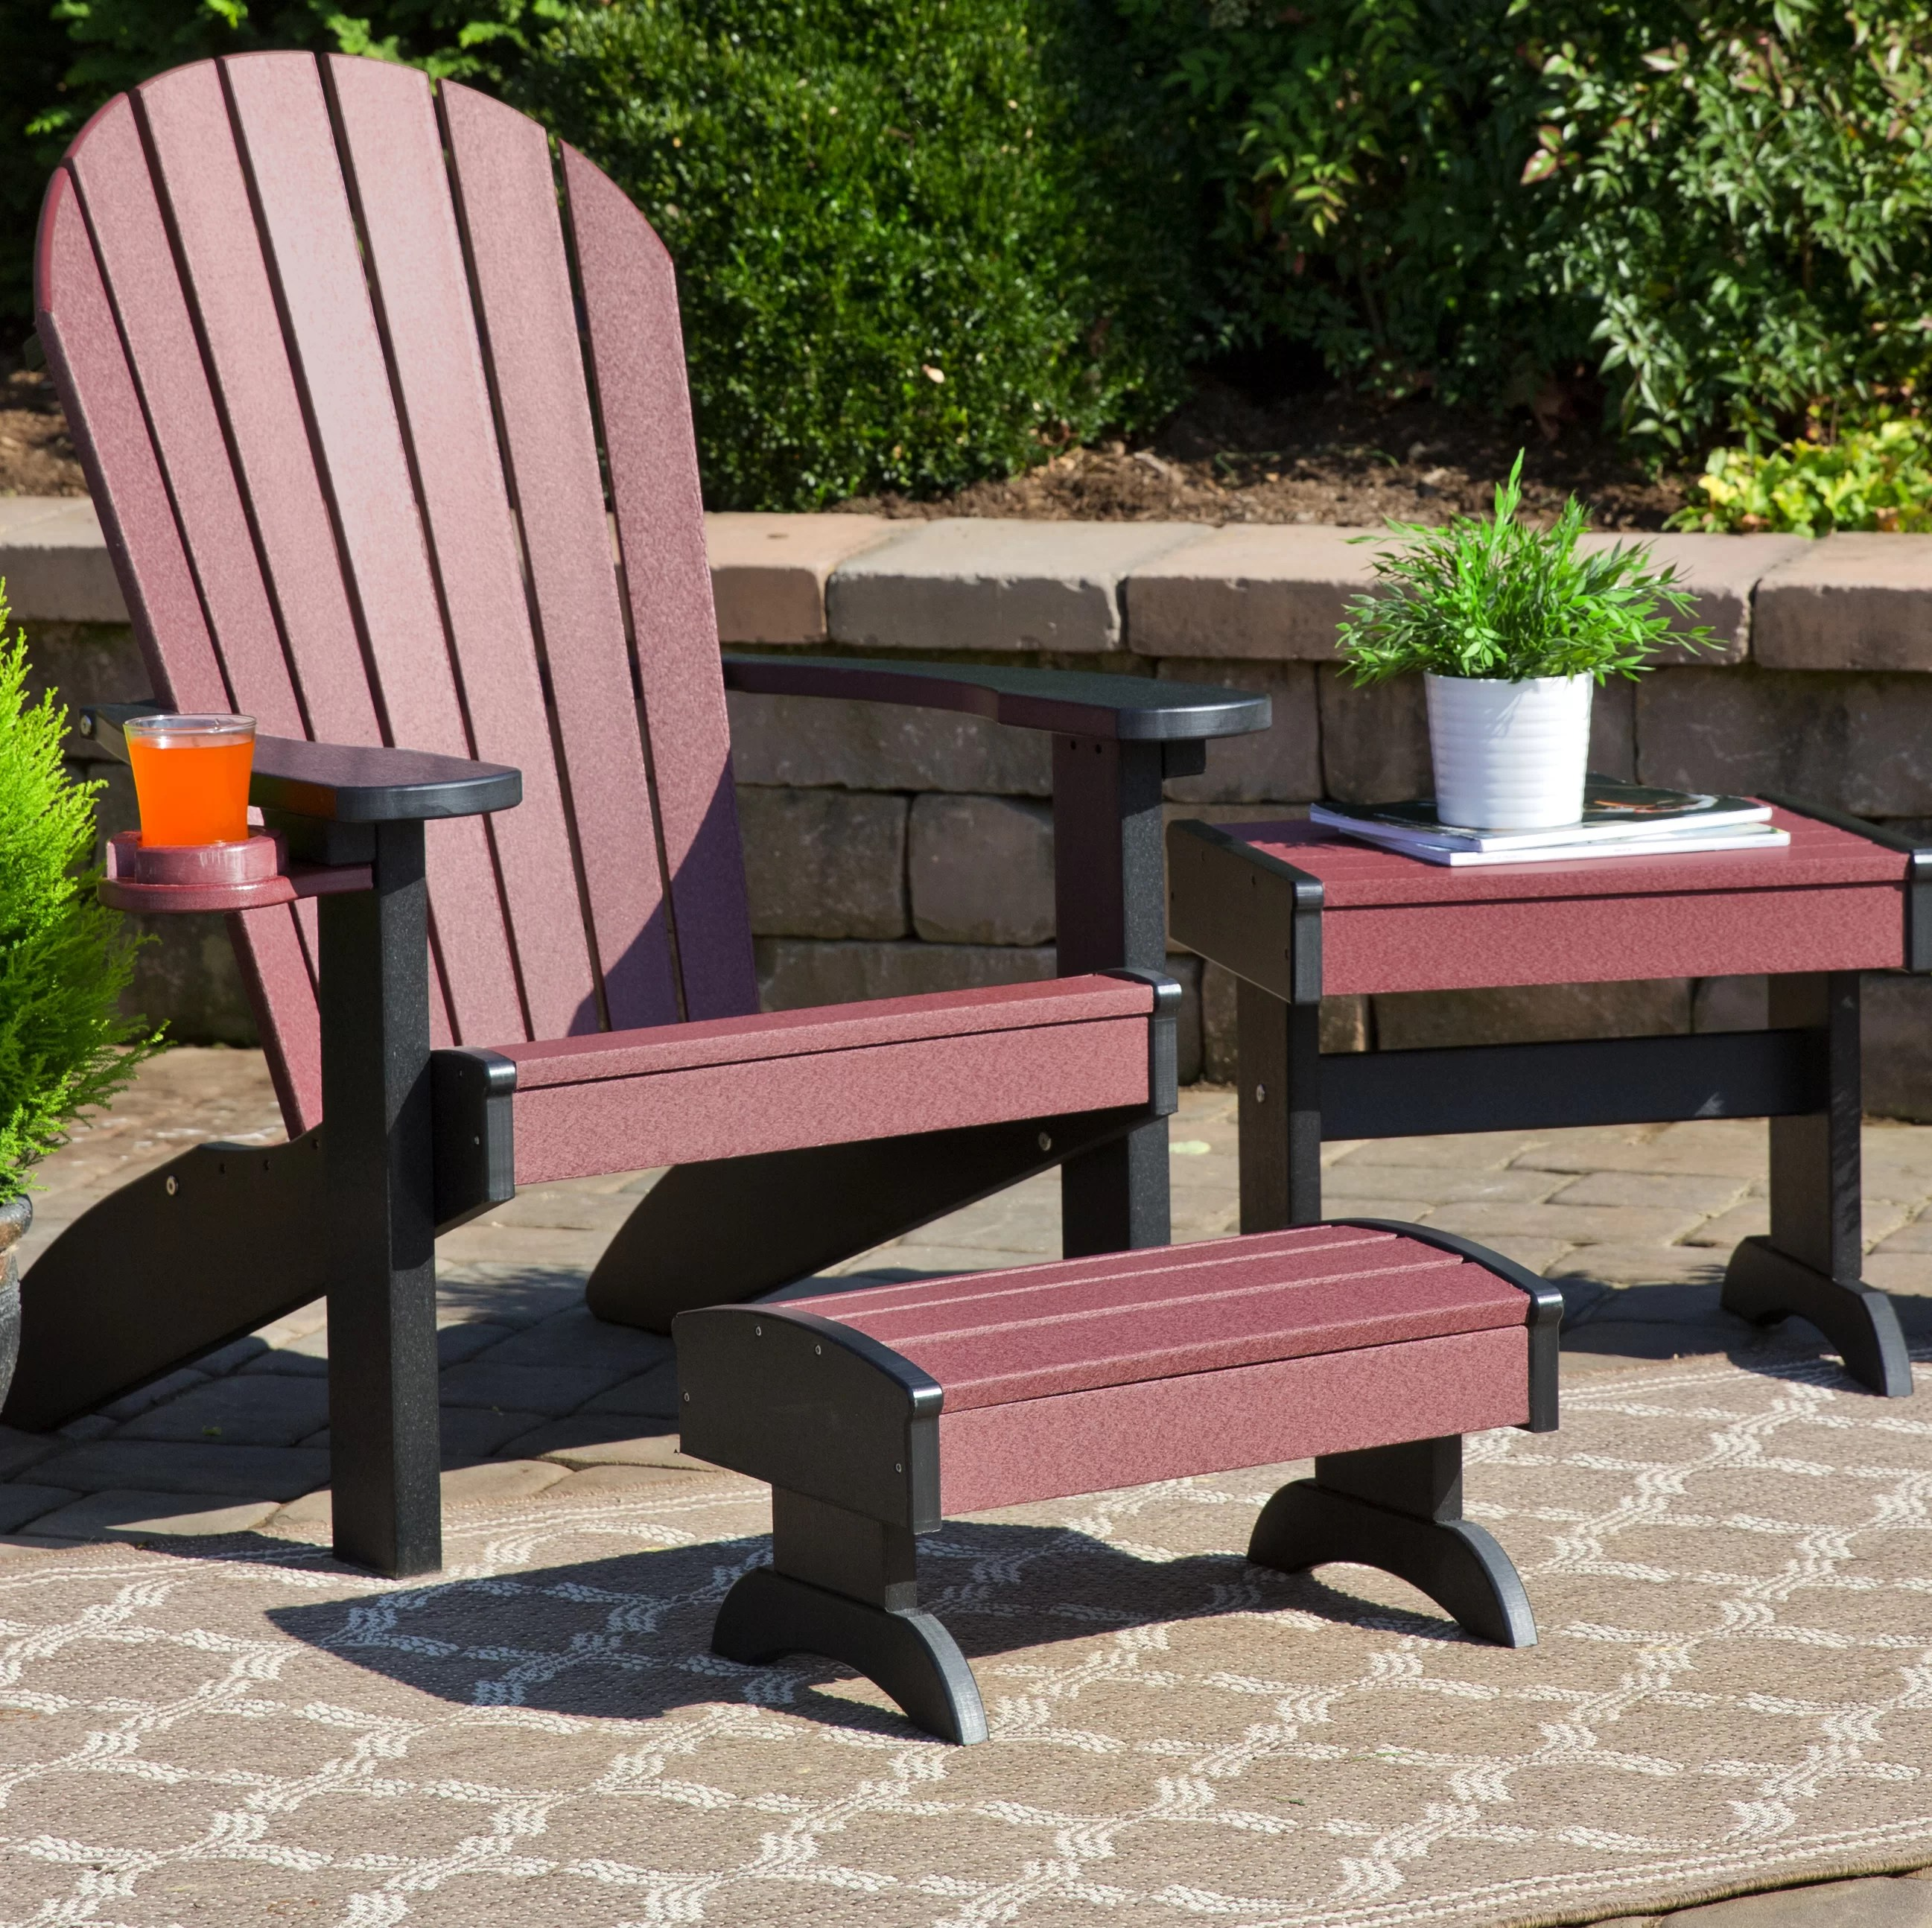 kells plastic adirondack chair set with ottoman and table